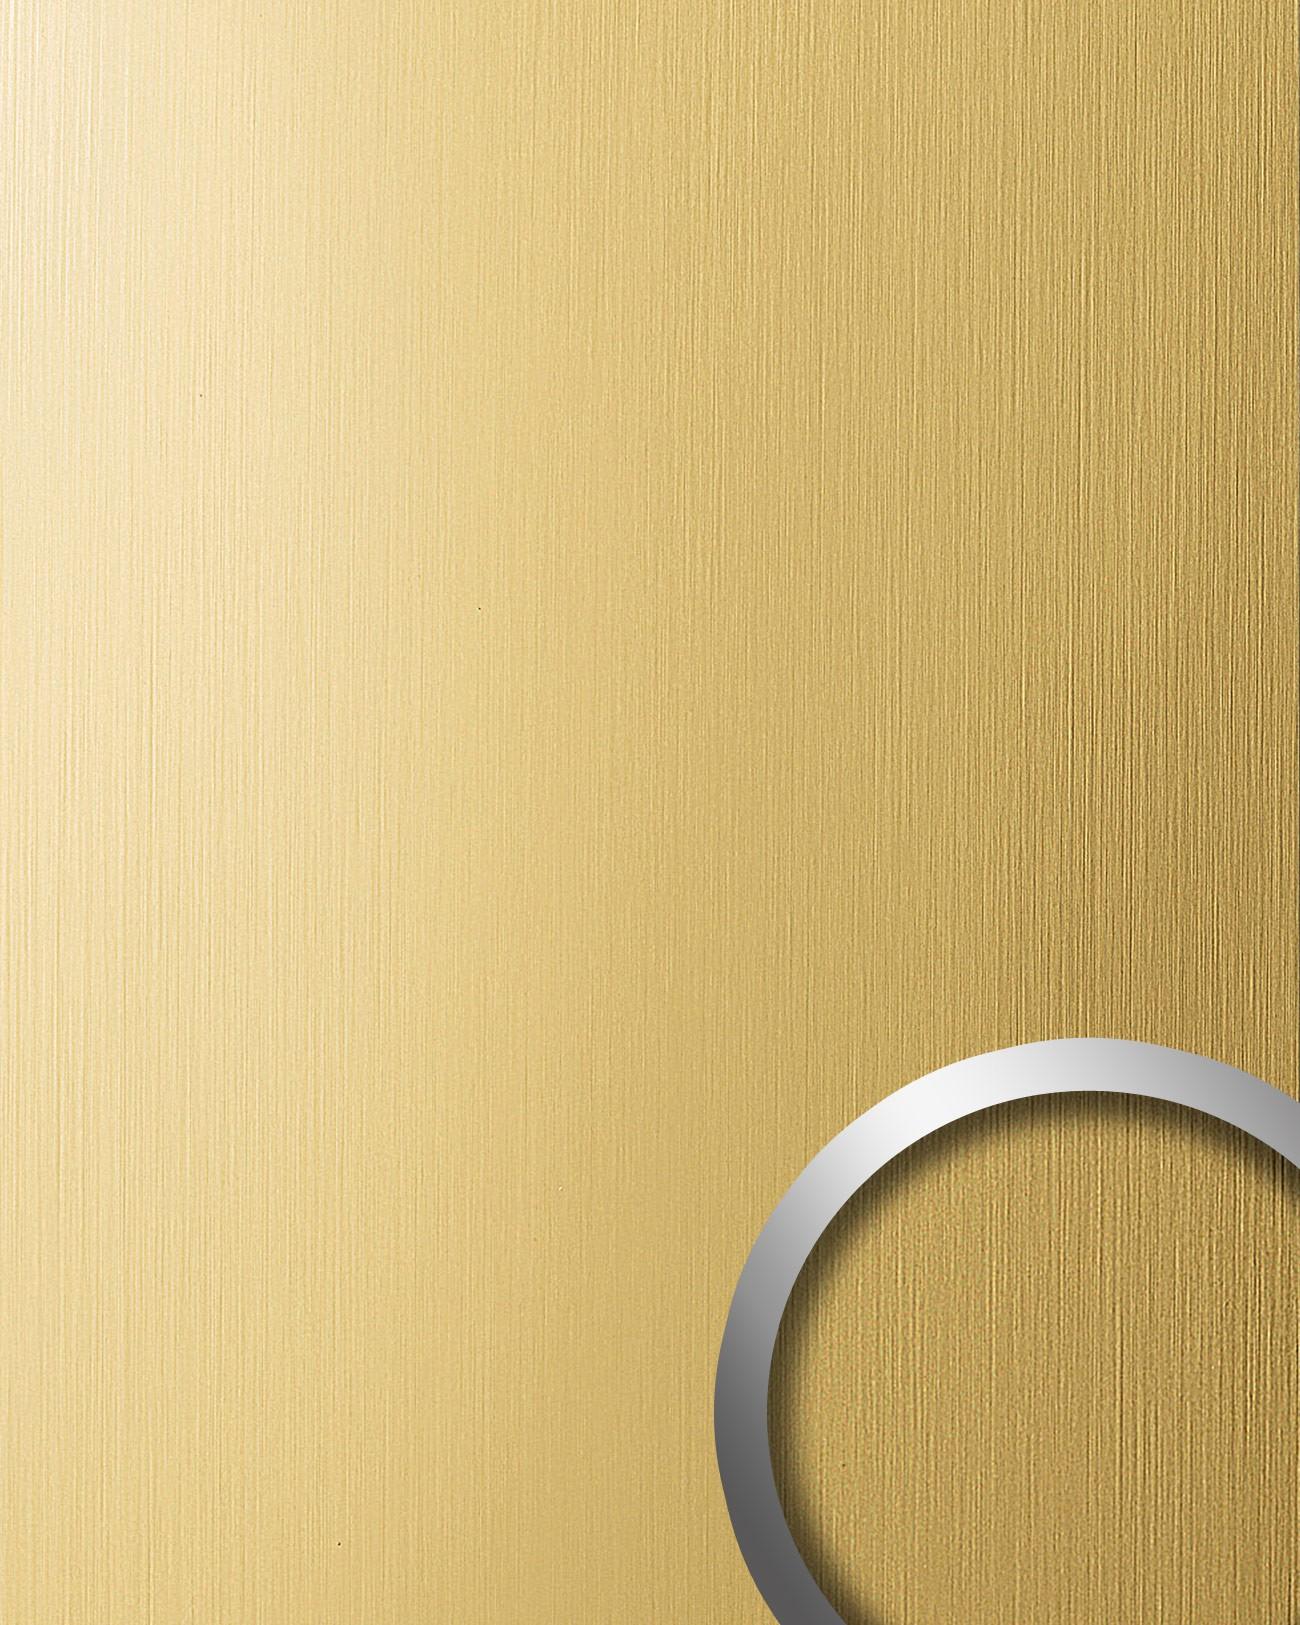 Selbstklebende Tapete Gelb : Dekoration selbstklebende Tapete gelb-gold geb?rstet matt 2,60 qm